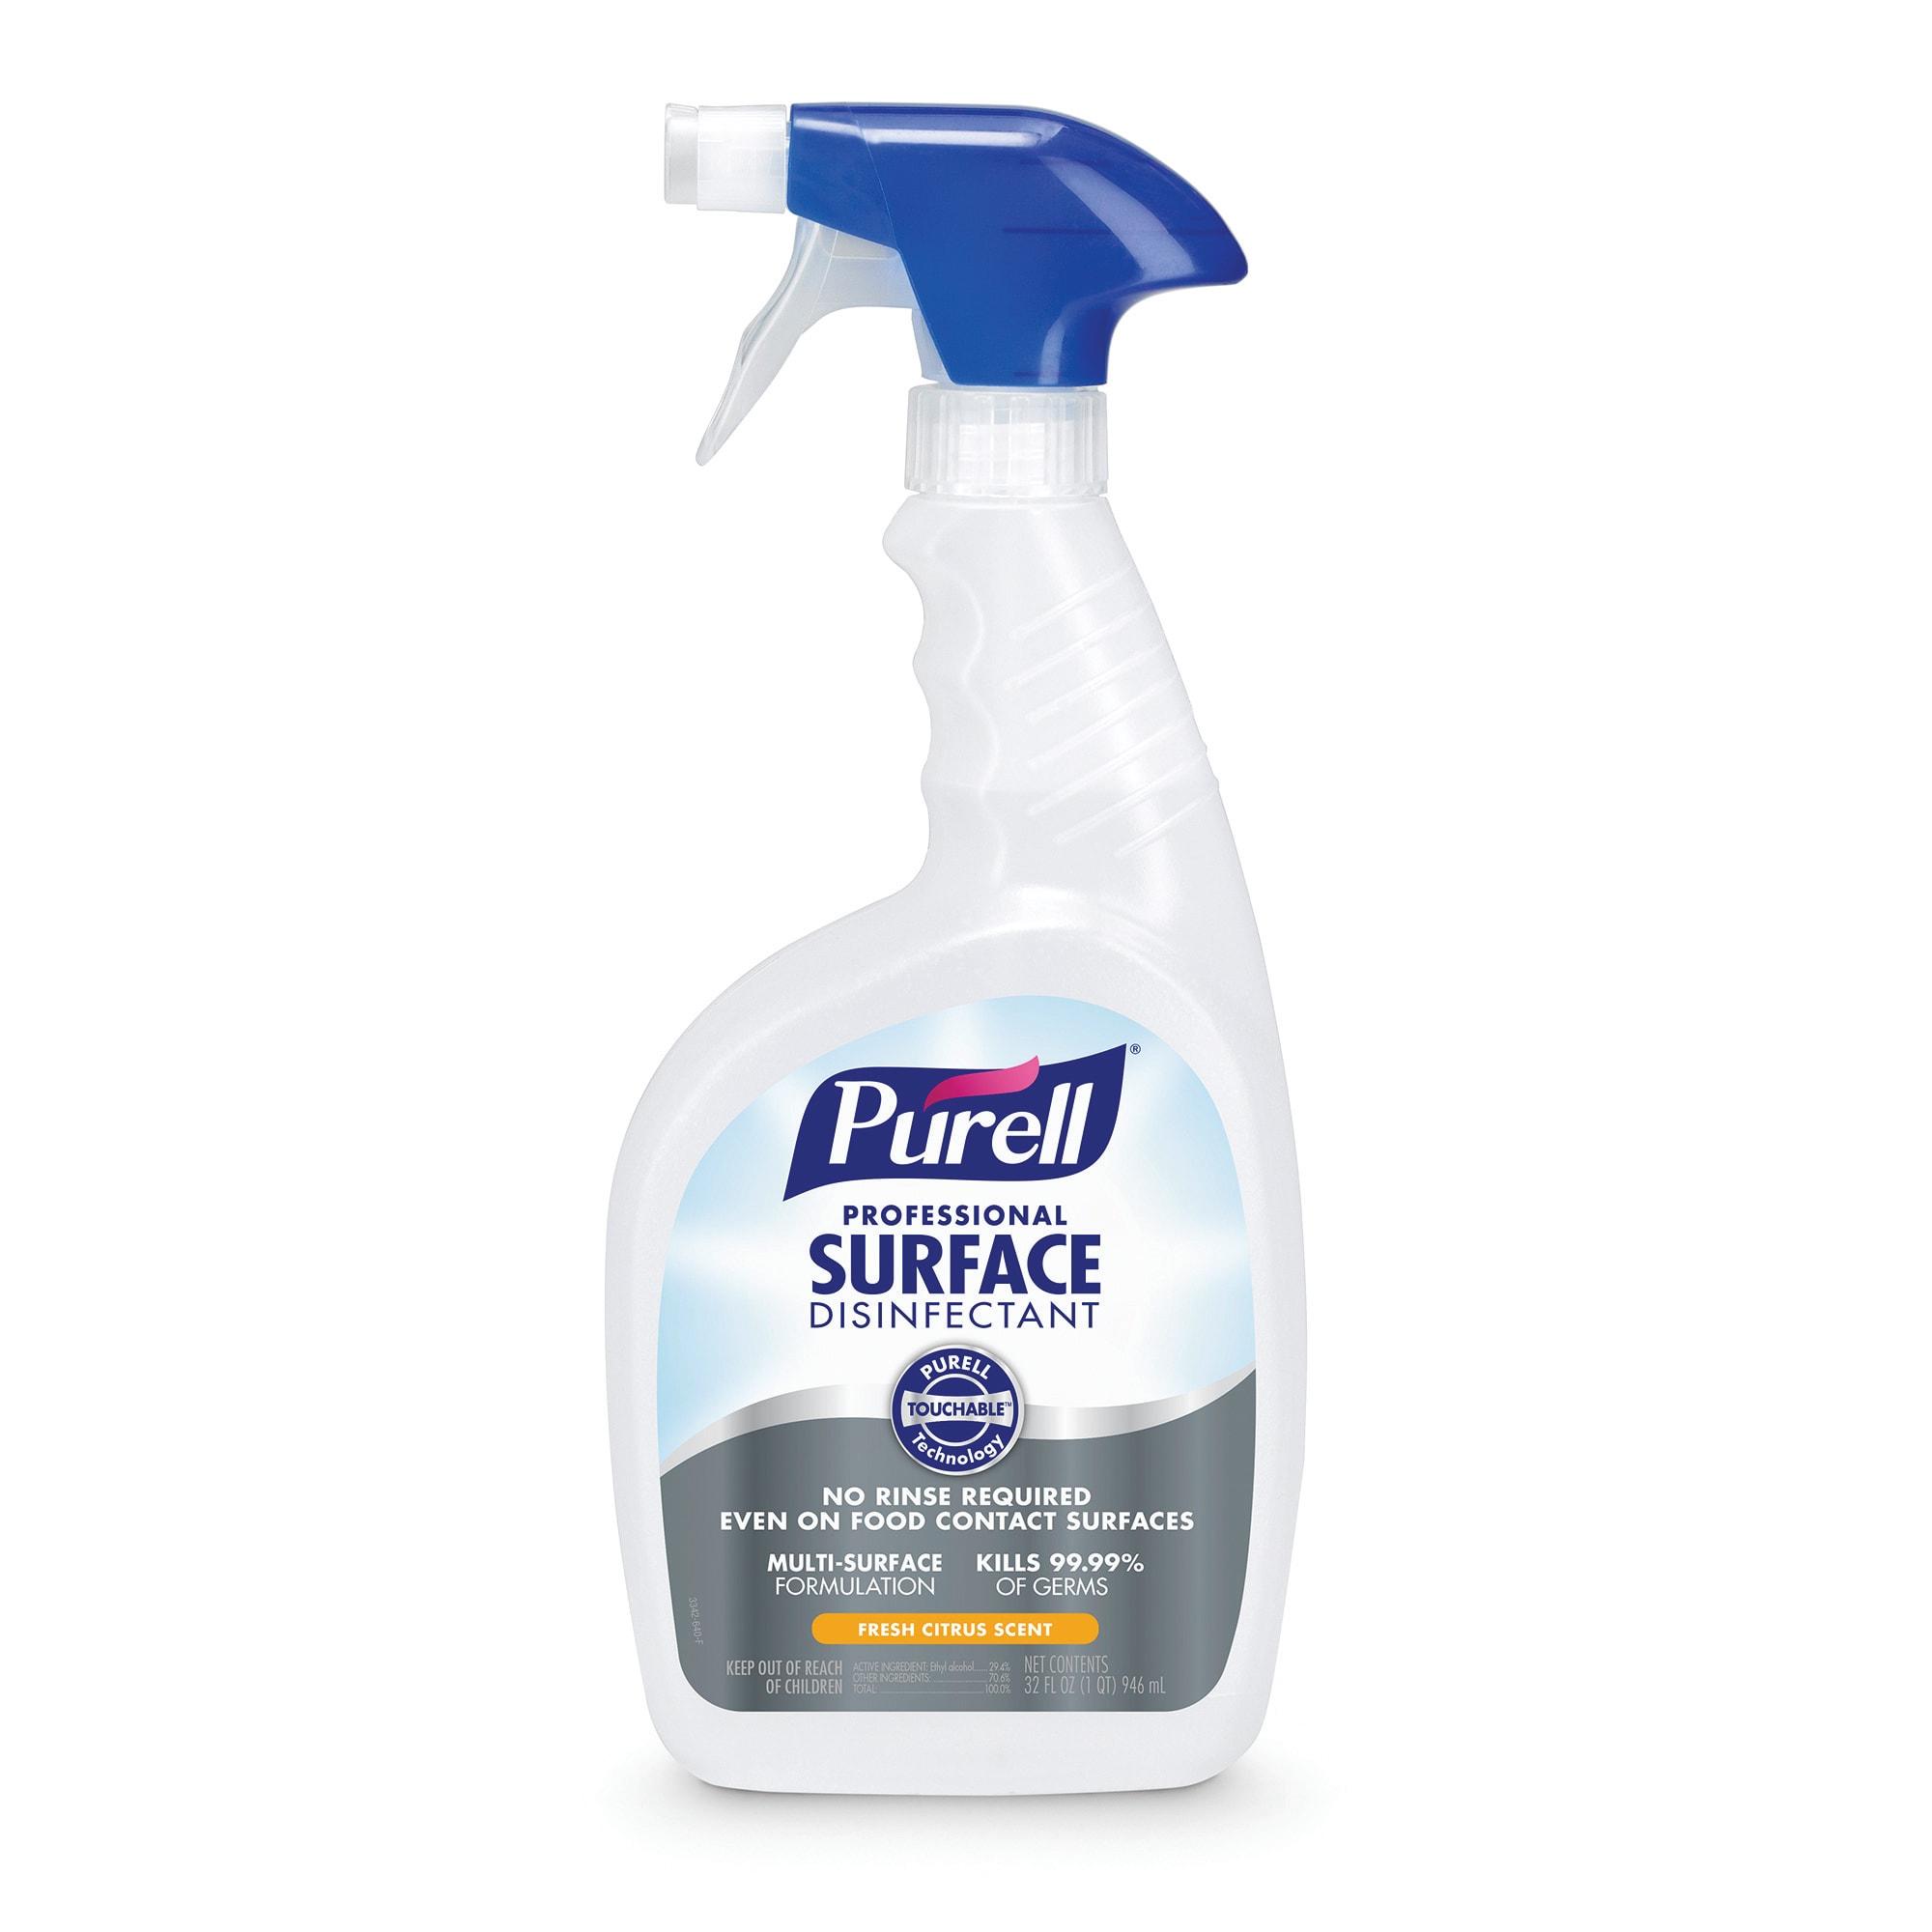 Purell® Professional Surface Disinfectant, Spray Bottle, Fresh Citrus, 32 Oz, Case Of 12